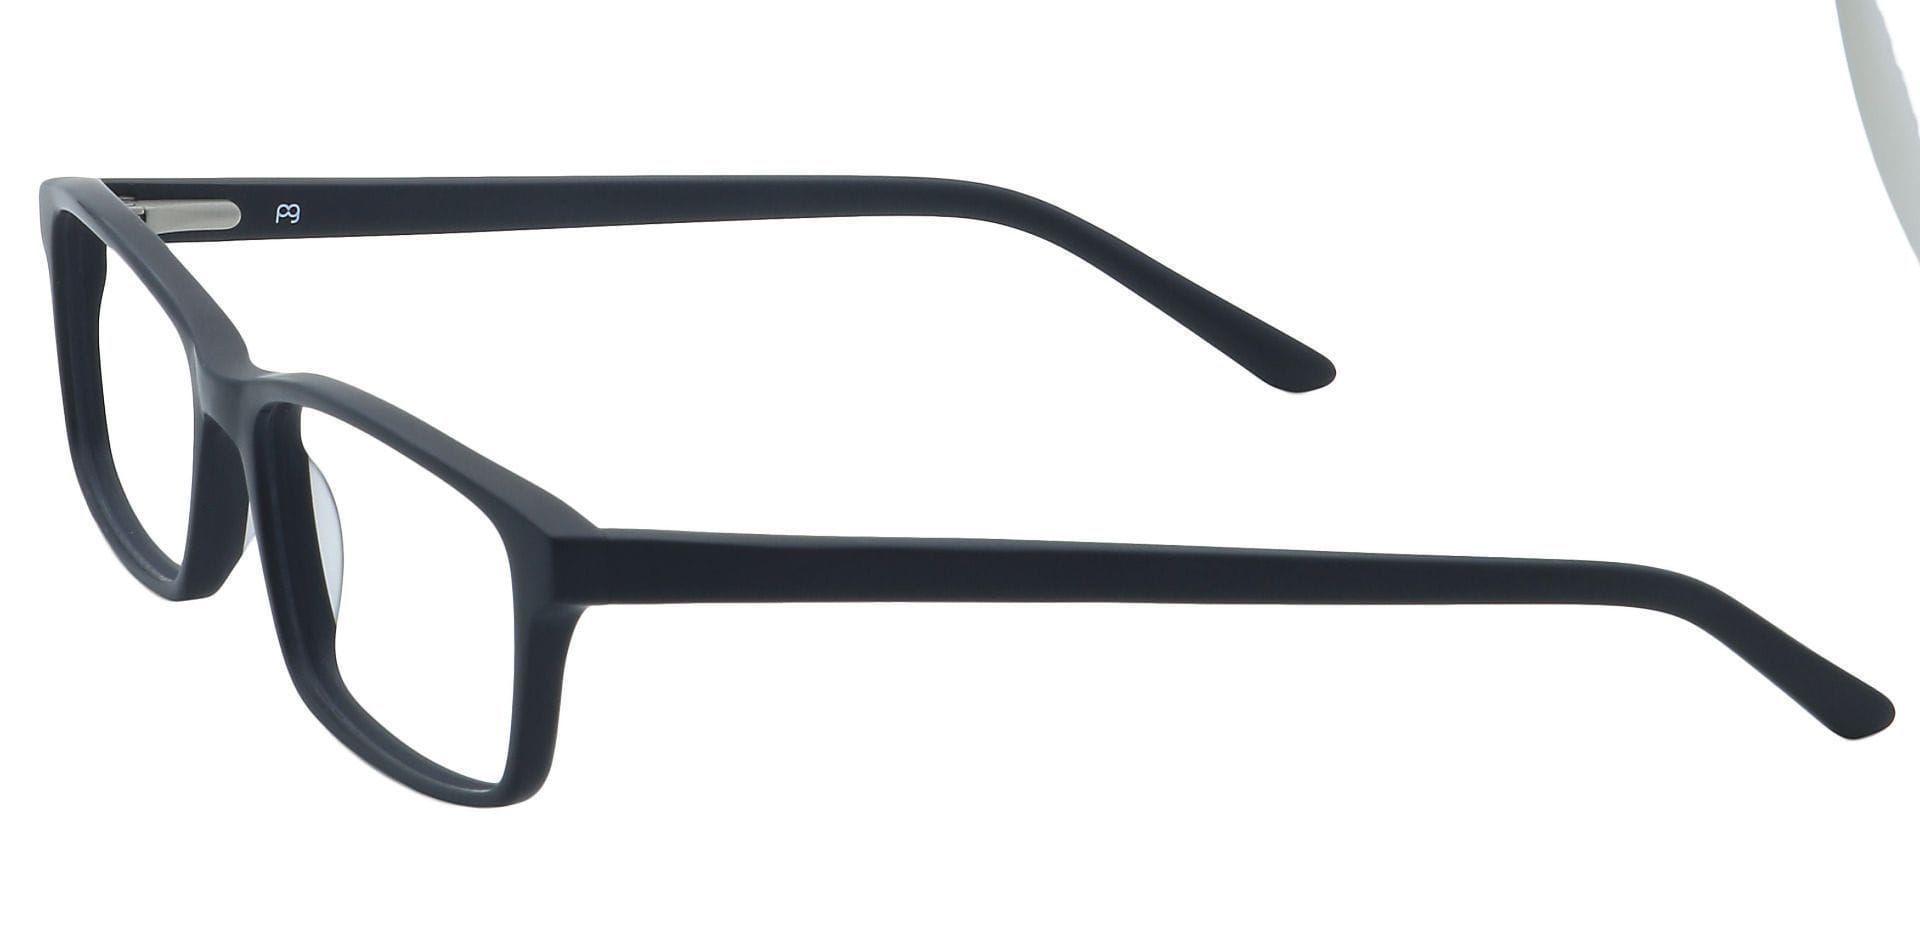 Suave Rectangle Prescription Glasses - Black